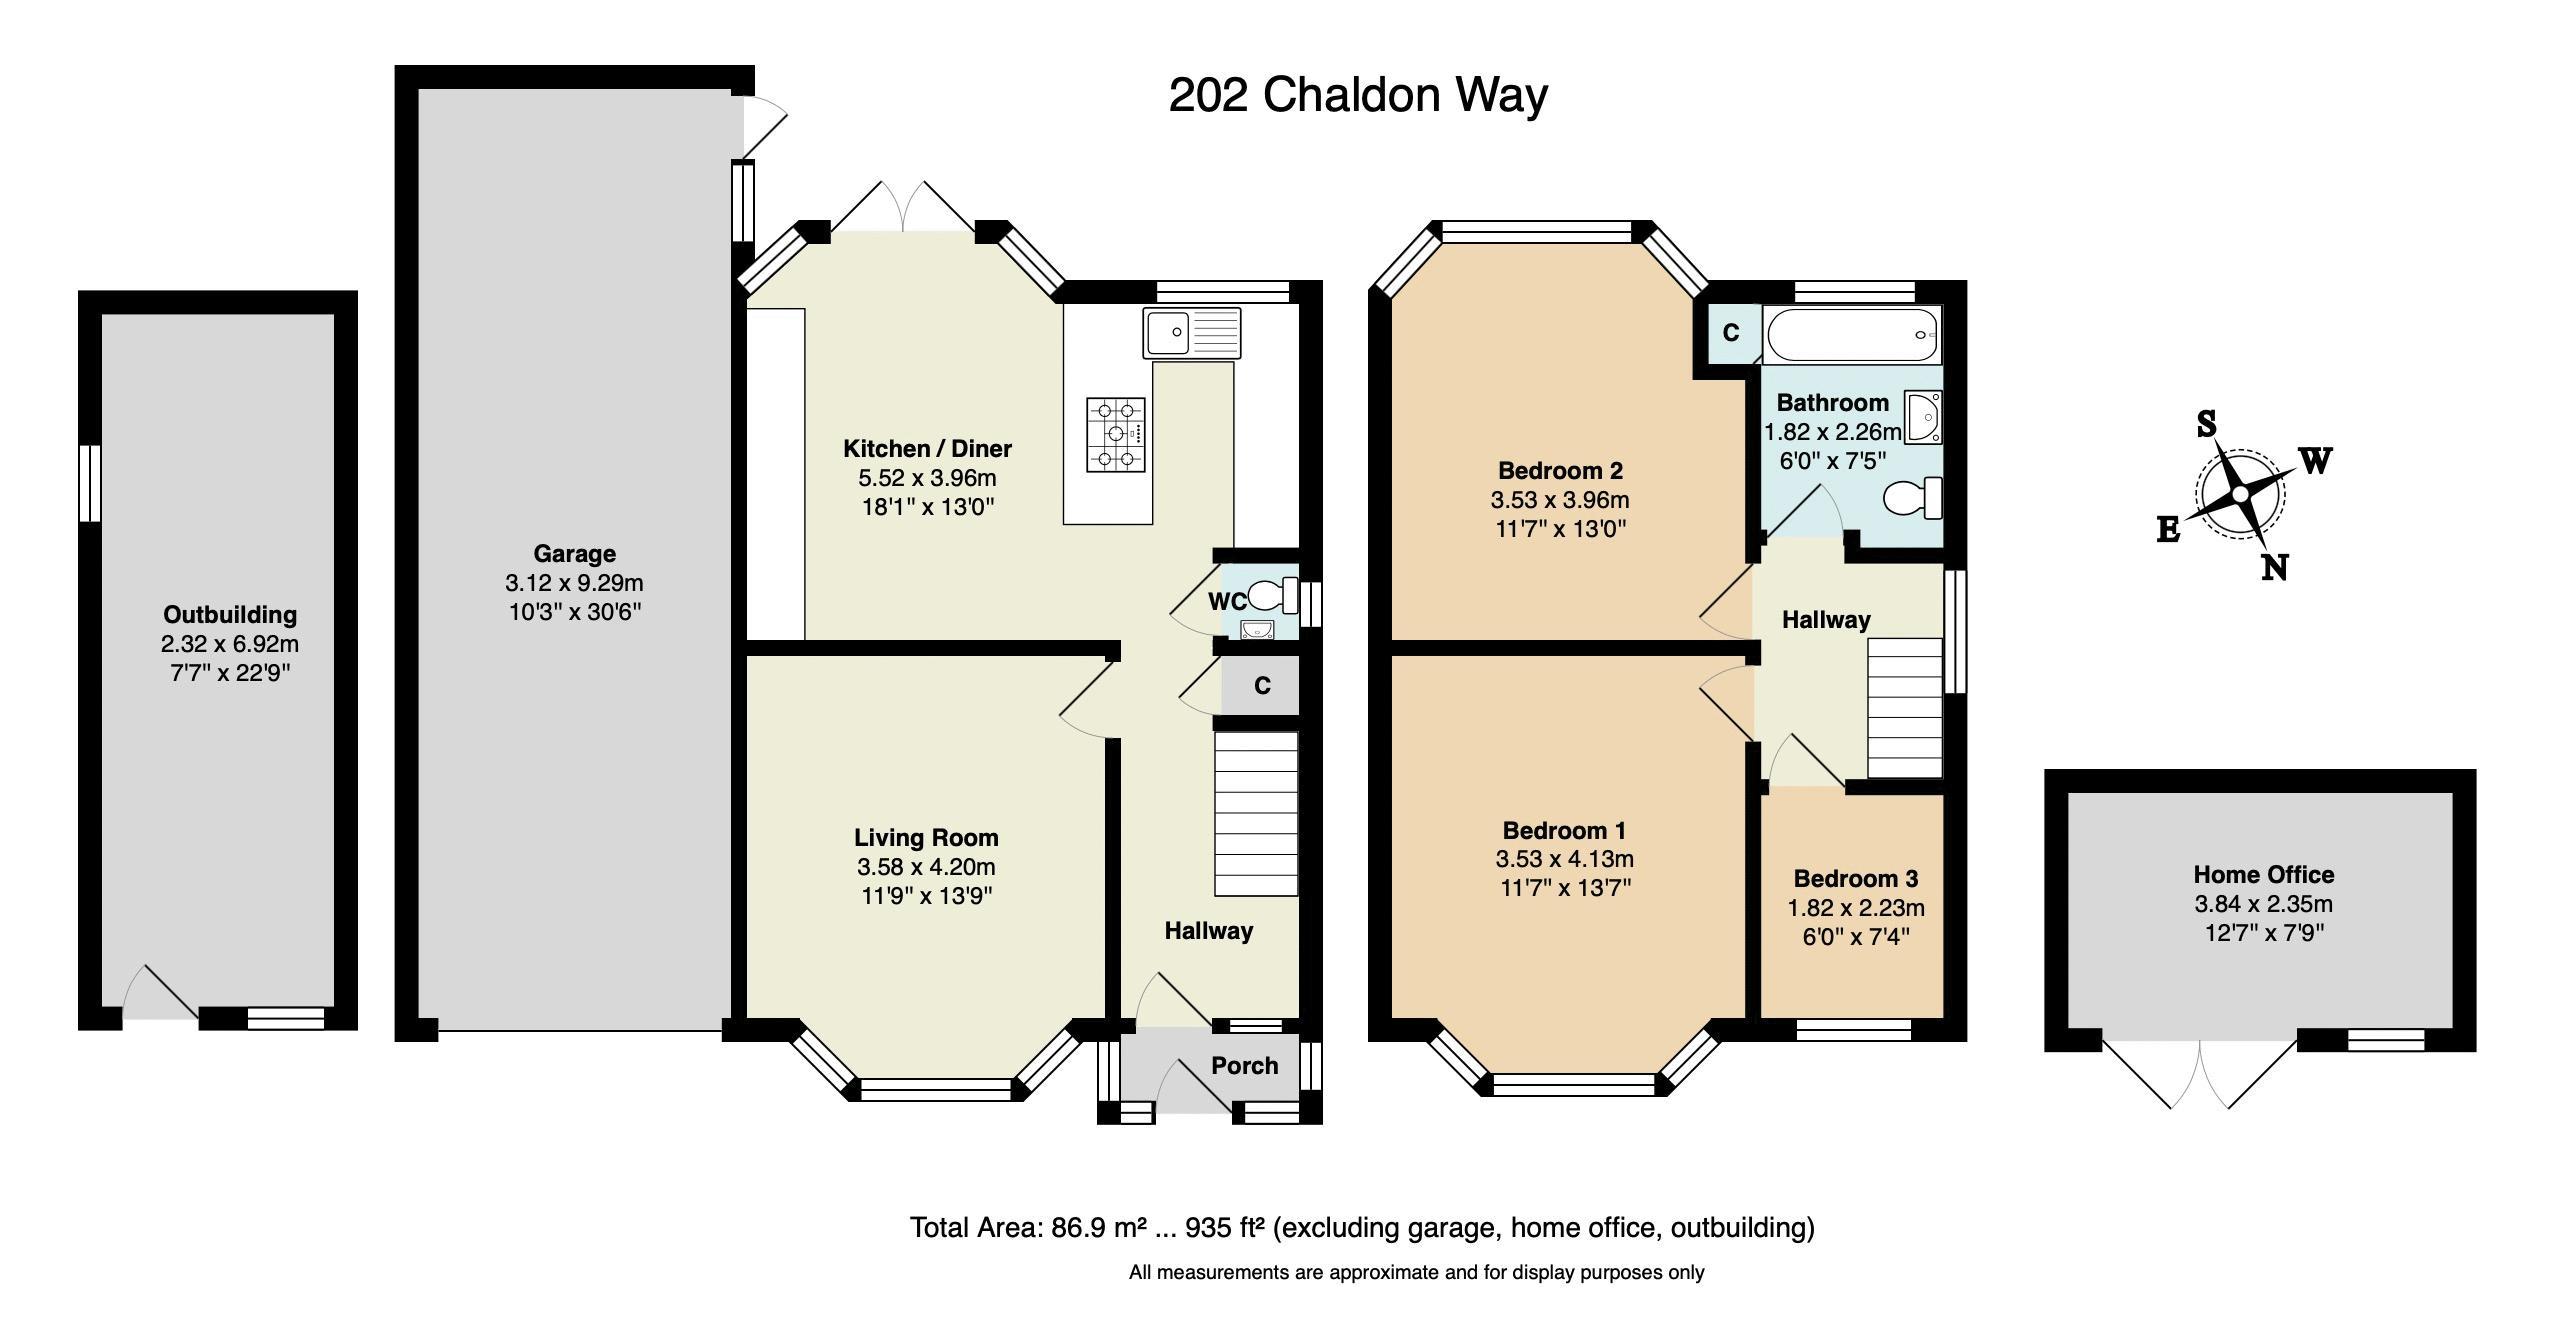 Chaldon Way